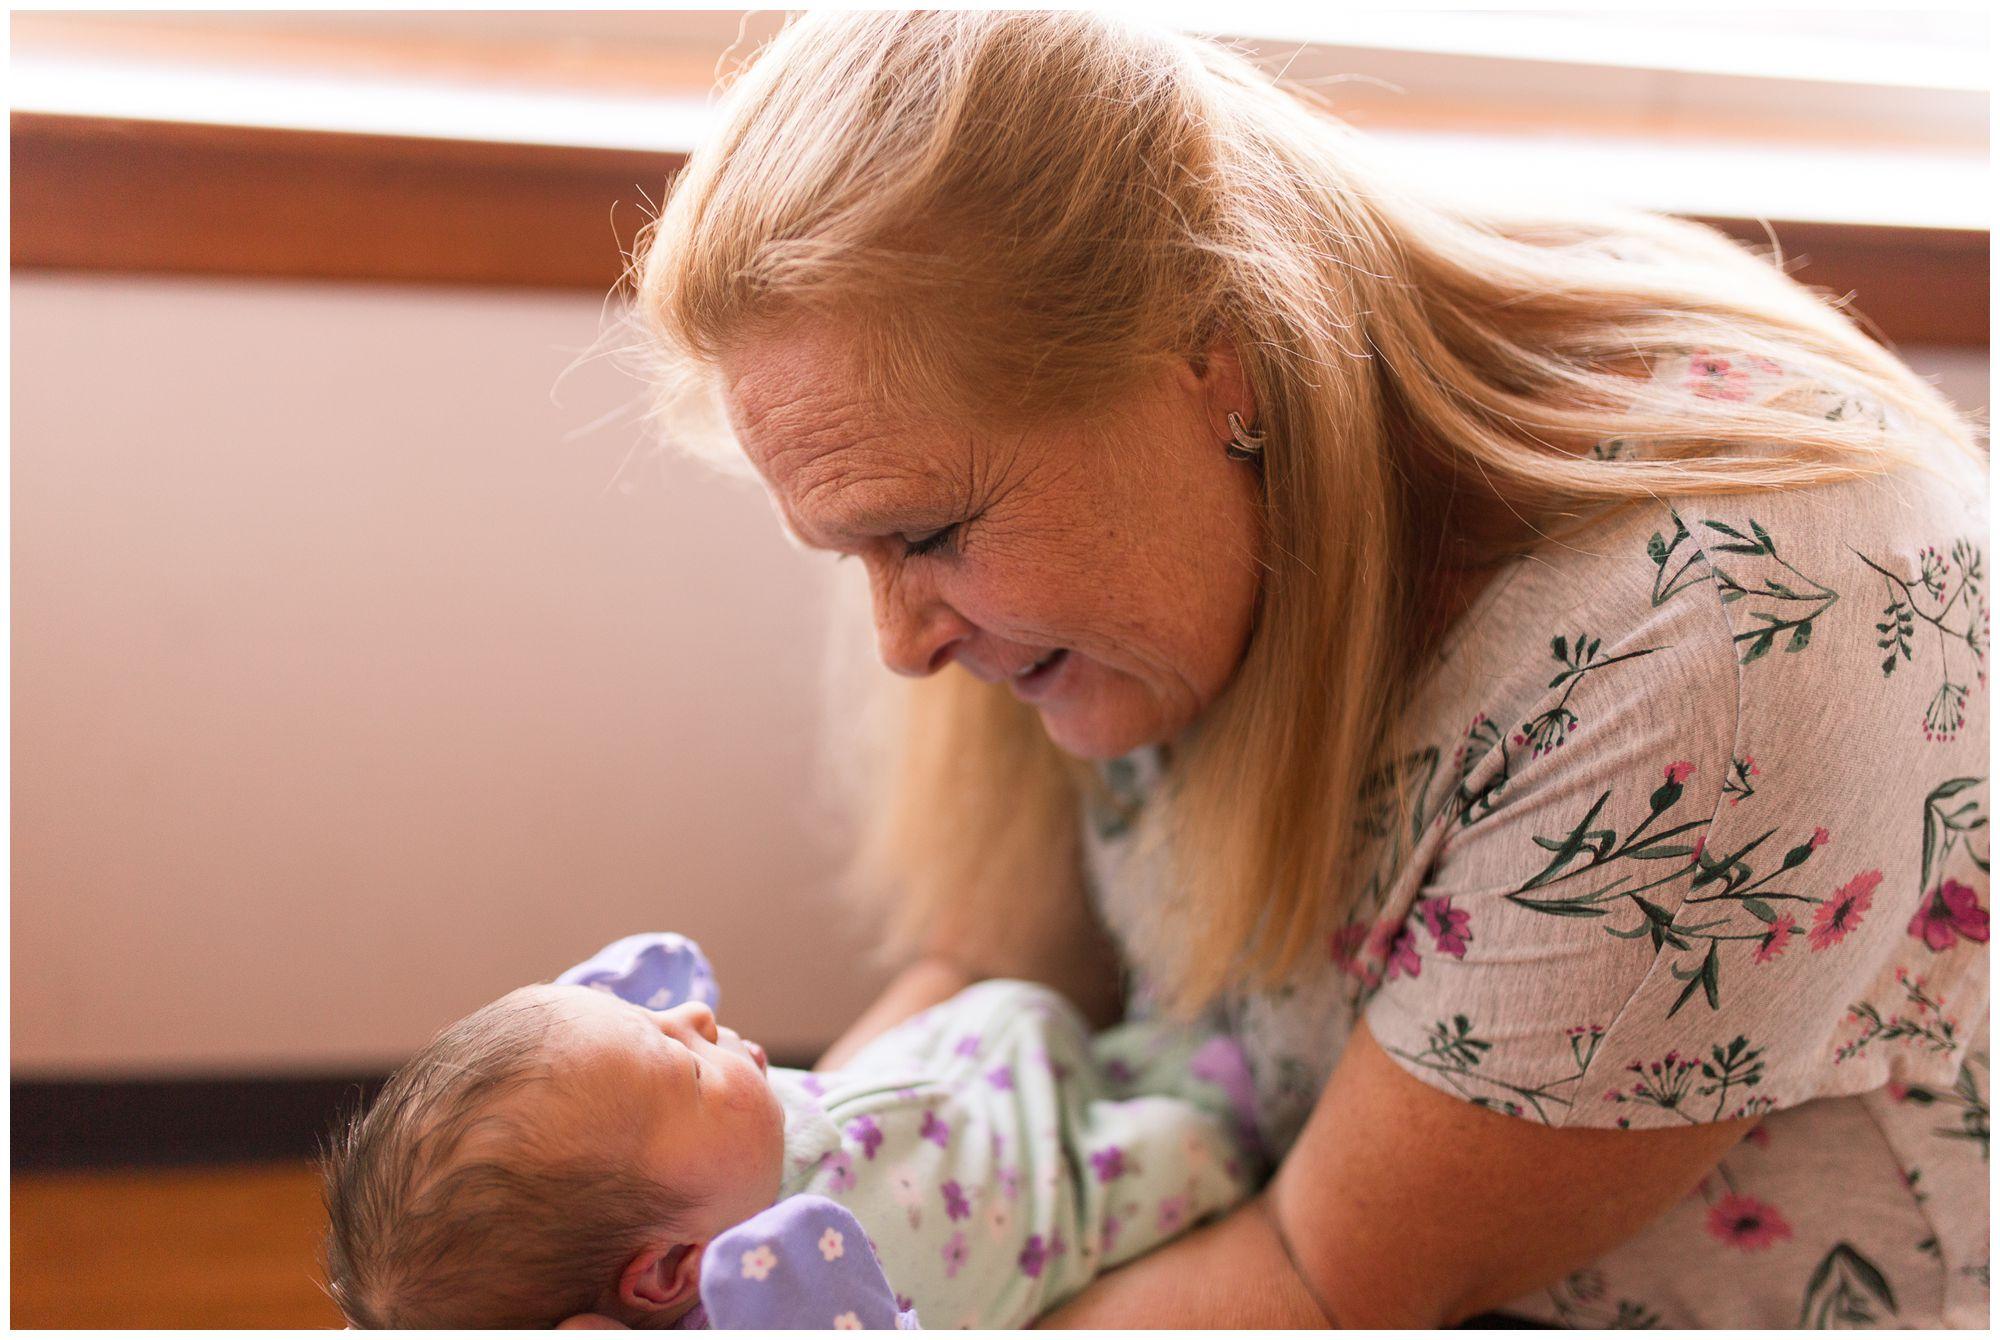 grandma with baby during Community Howard Regional Health newborn session in Kokomo Indiana